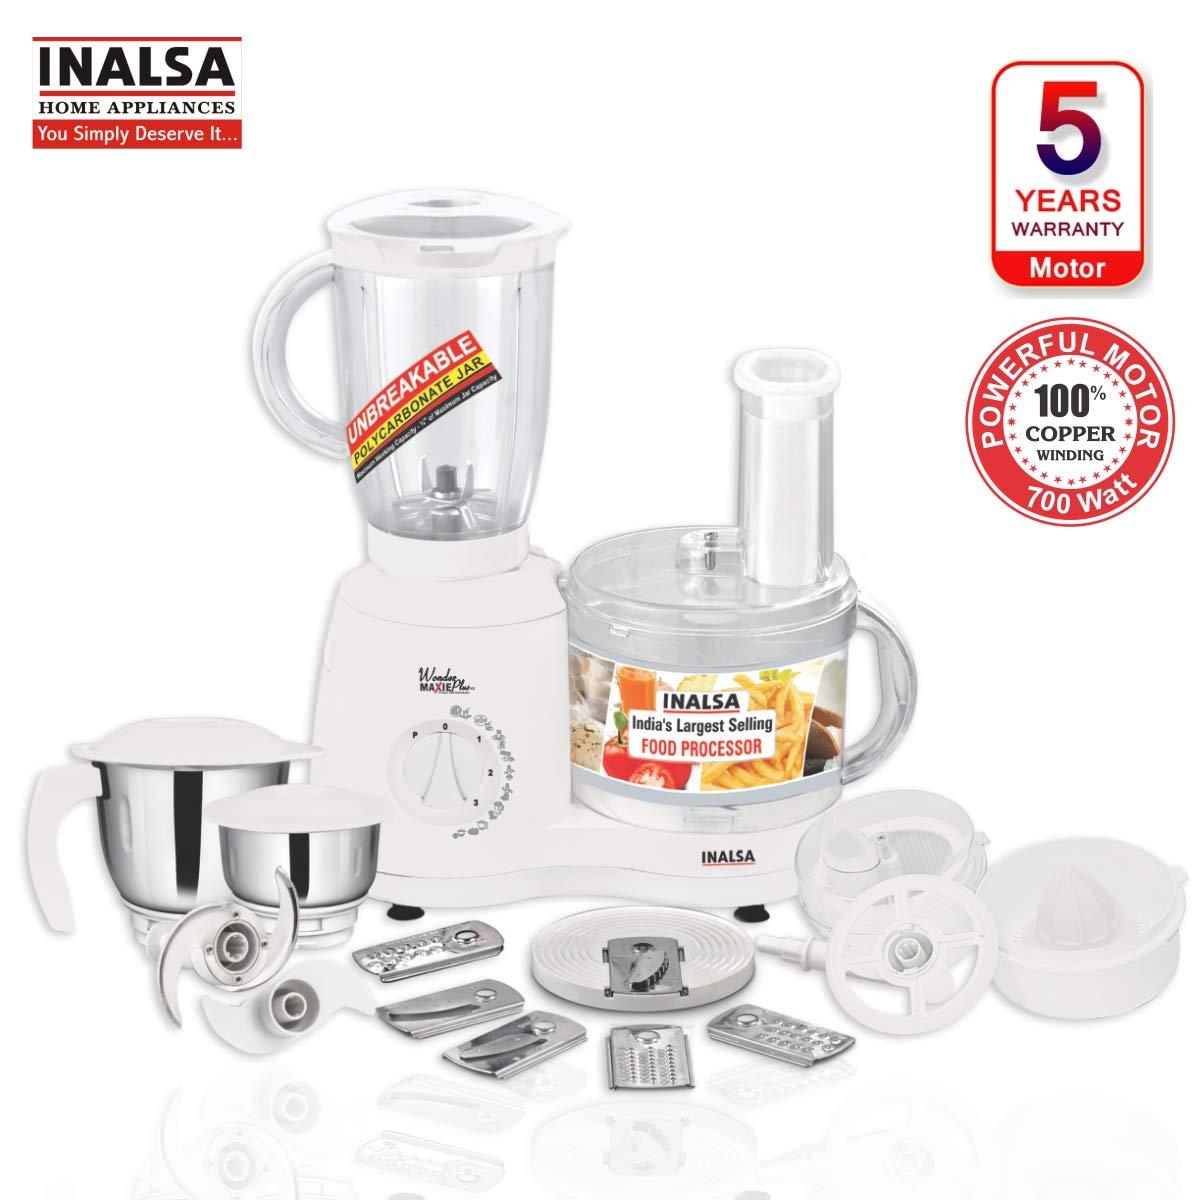 india-food-processor-best-image